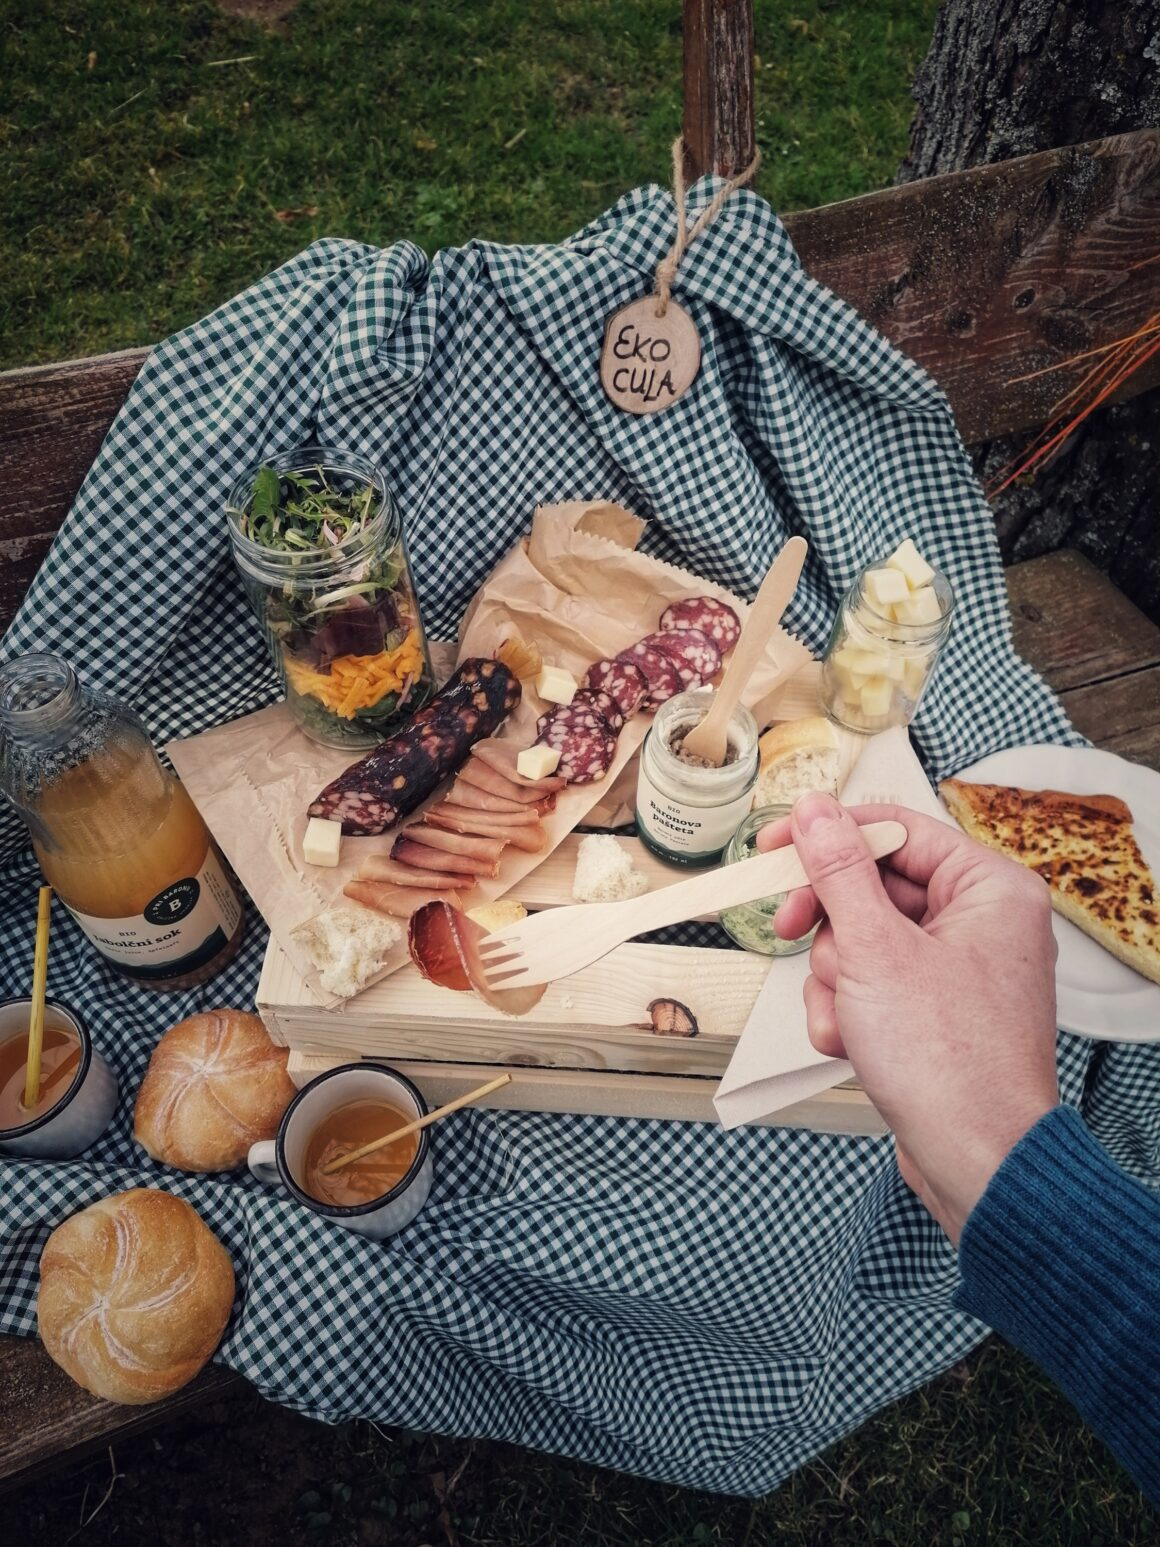 Eko piknik cula